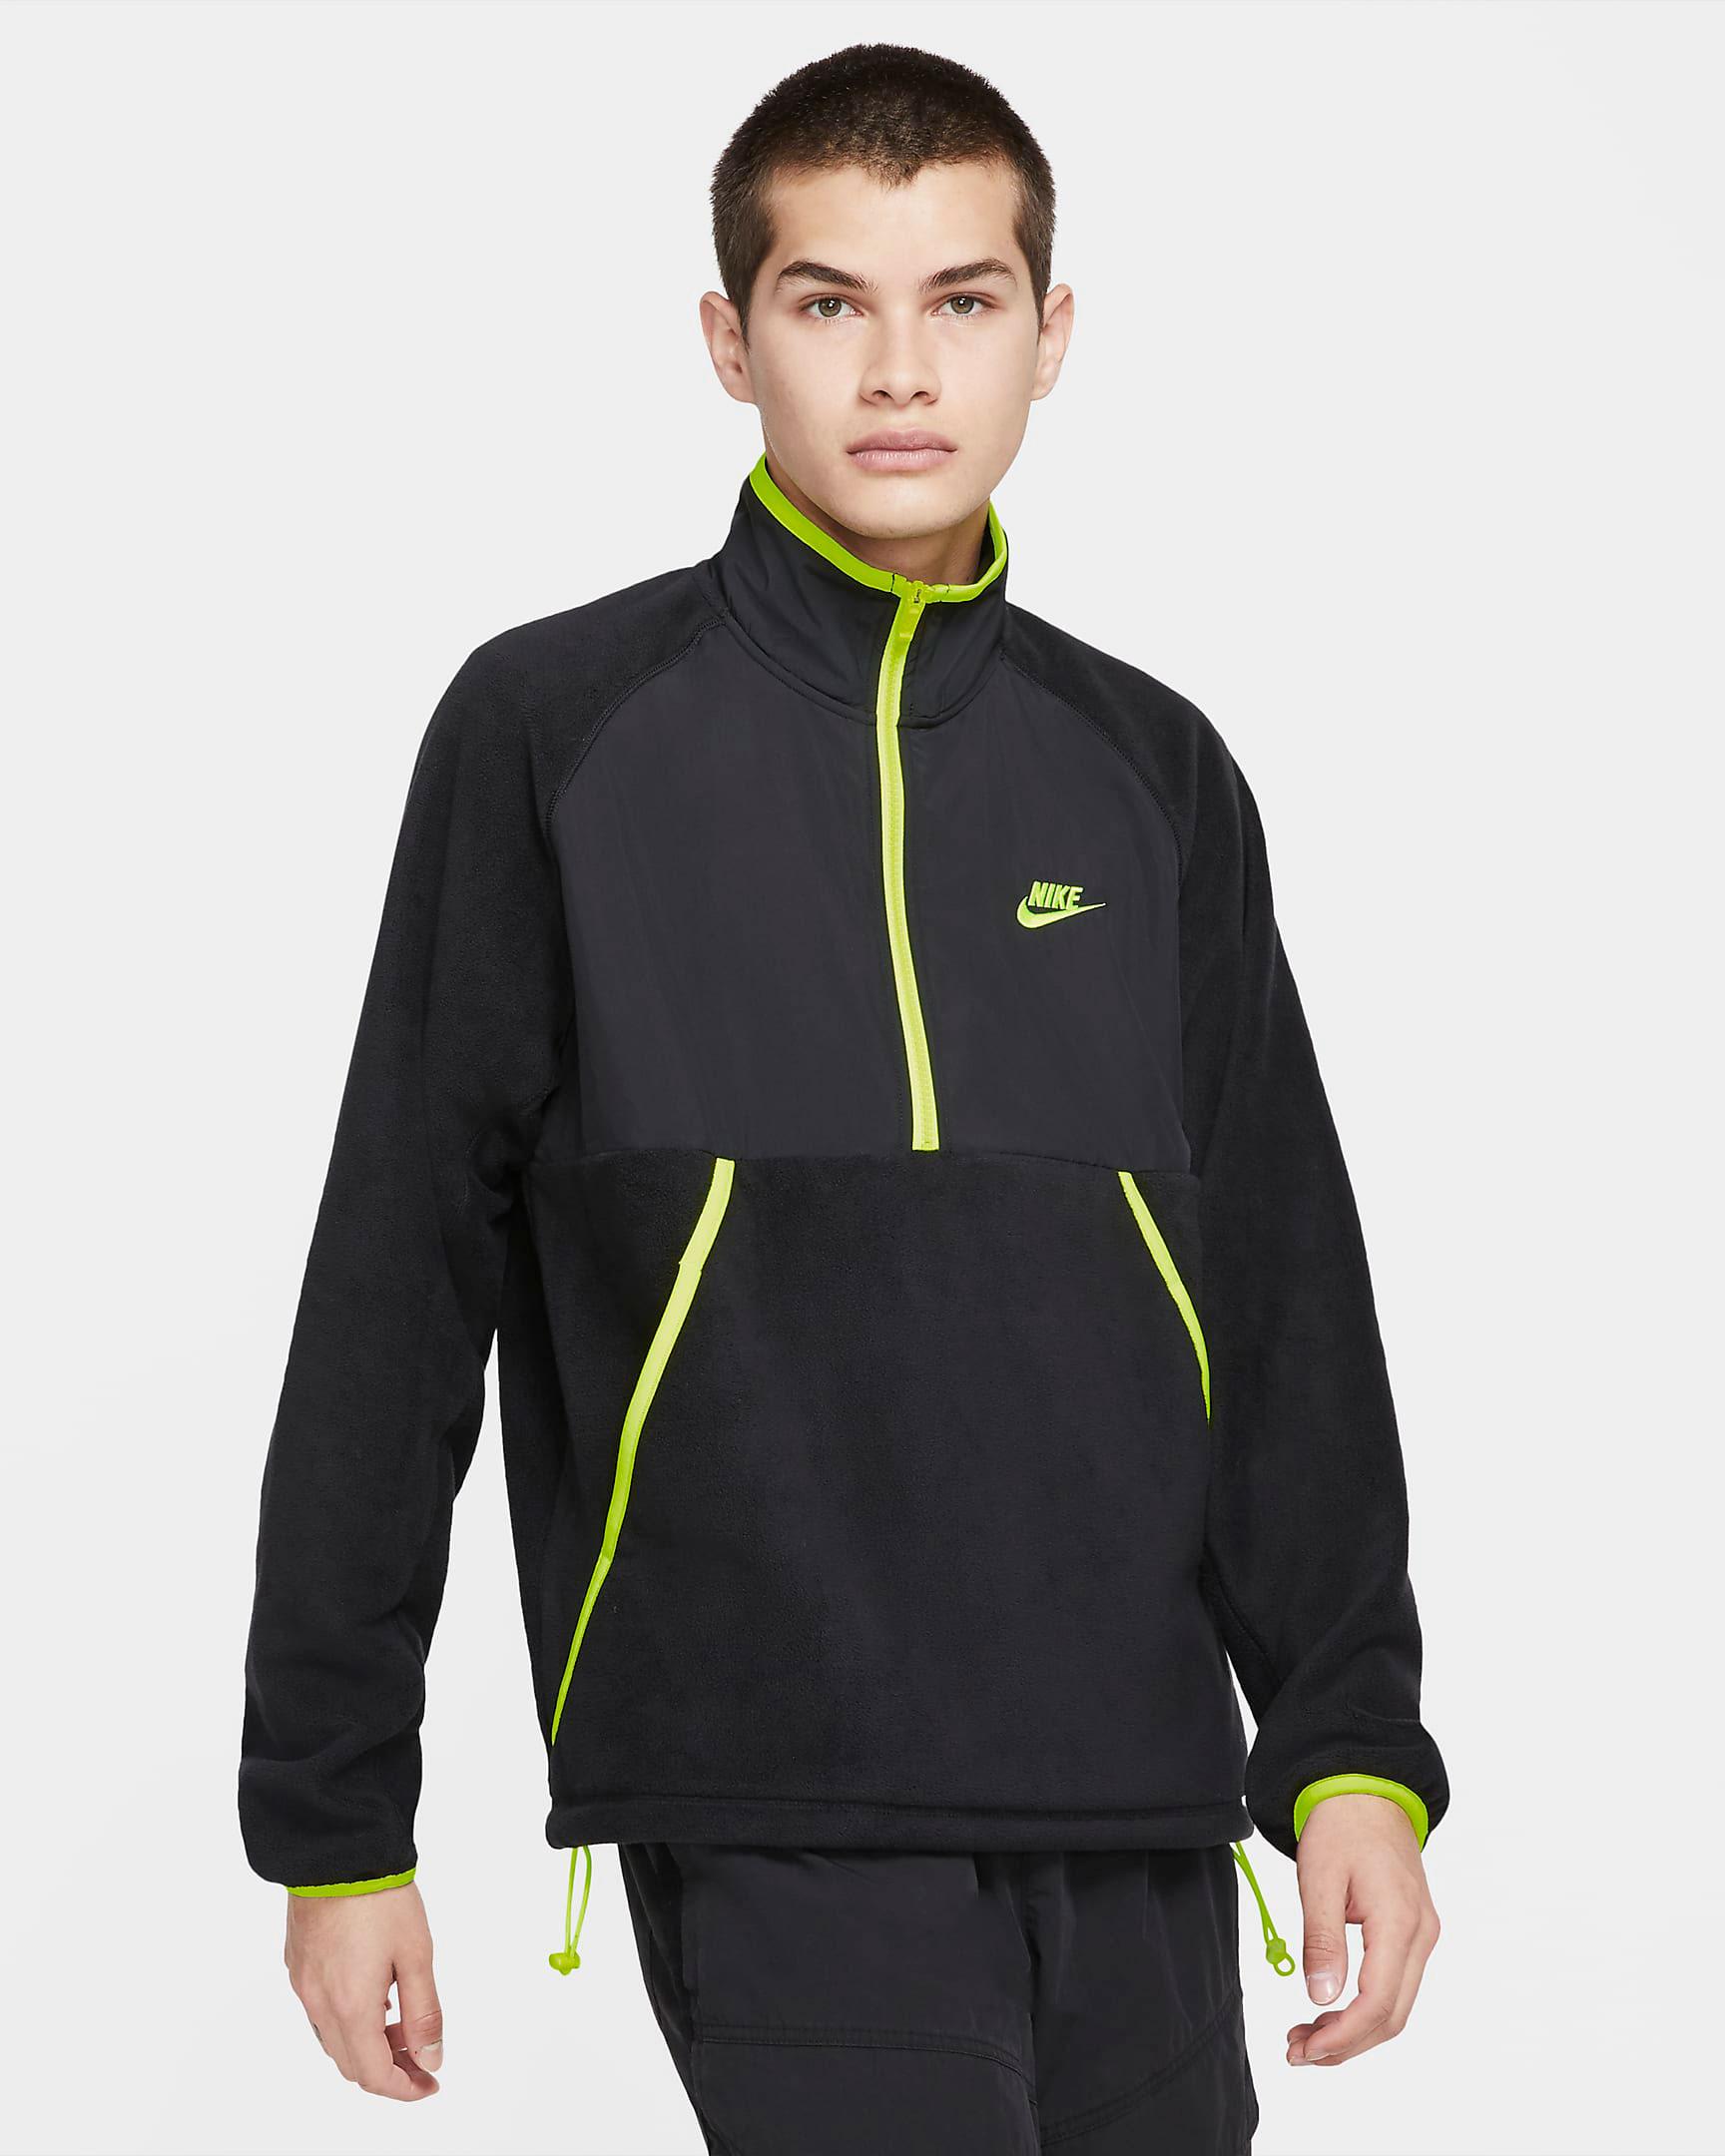 nike-sportswear-half-zip-top-black-volt